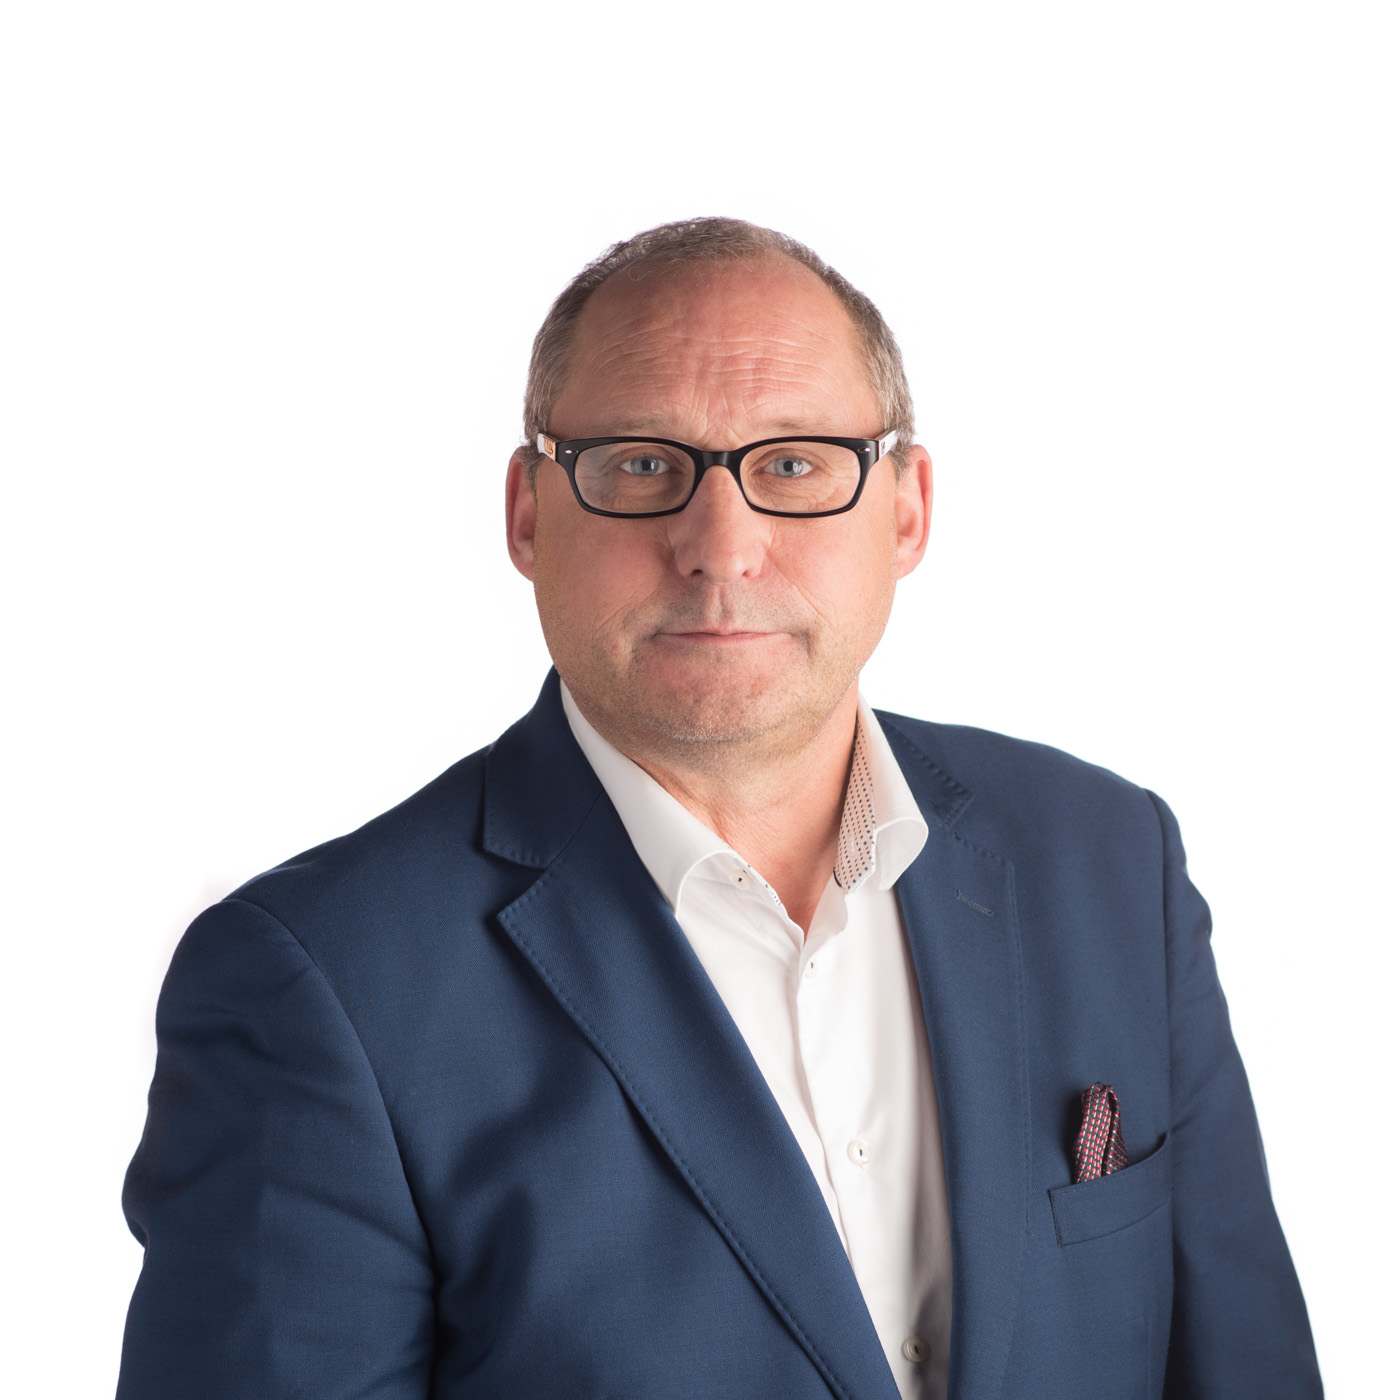 Mats Swensson